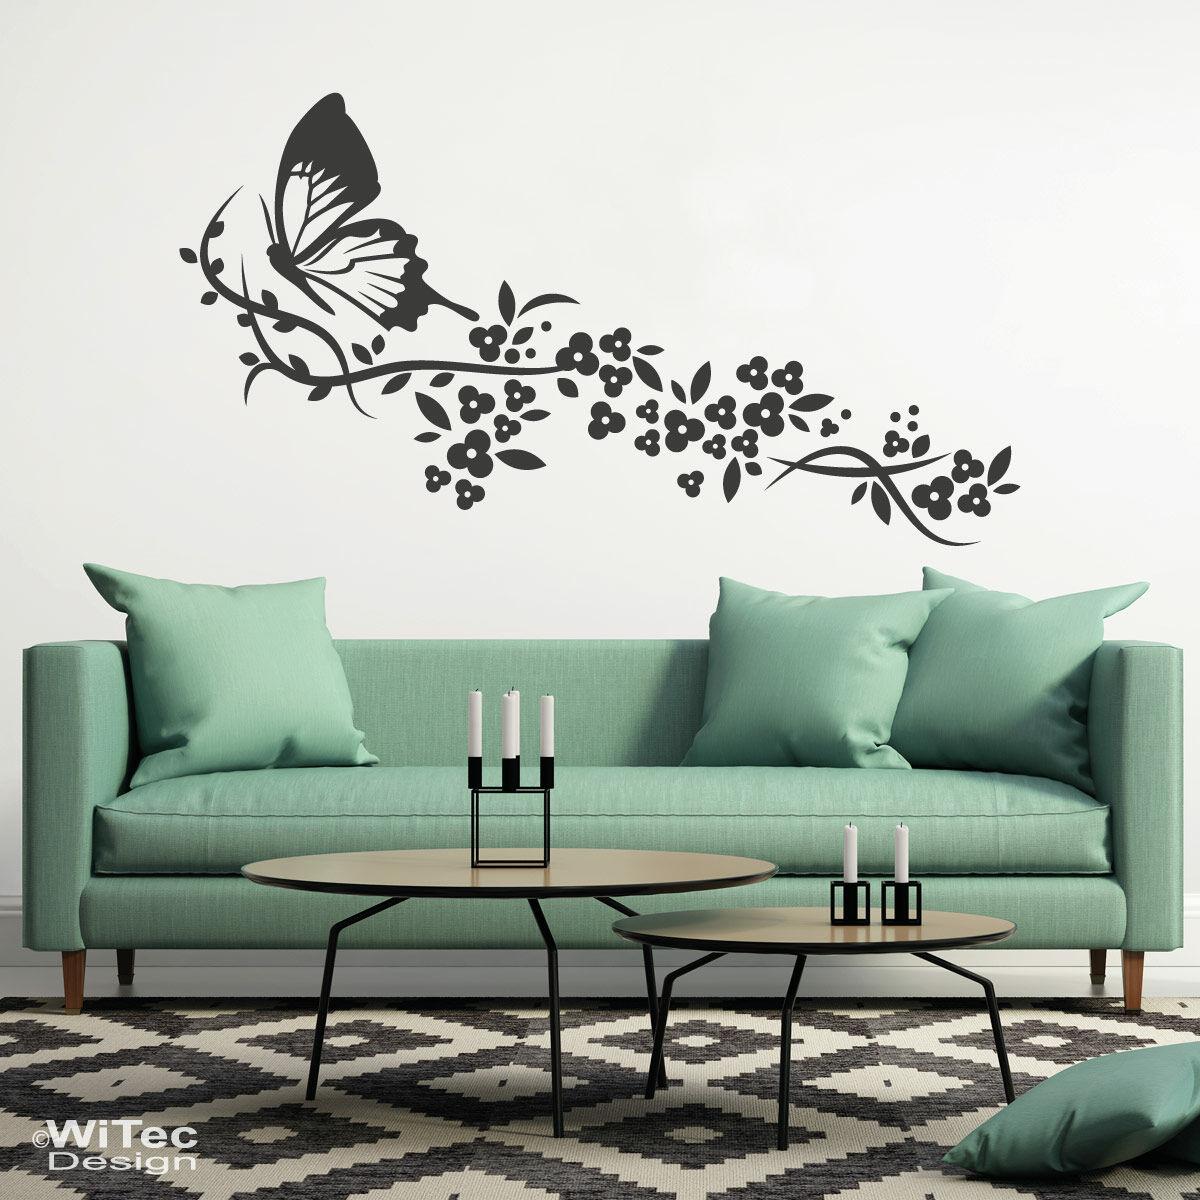 wandtattoo blumenranke schmetterling wandaufkleber. Black Bedroom Furniture Sets. Home Design Ideas